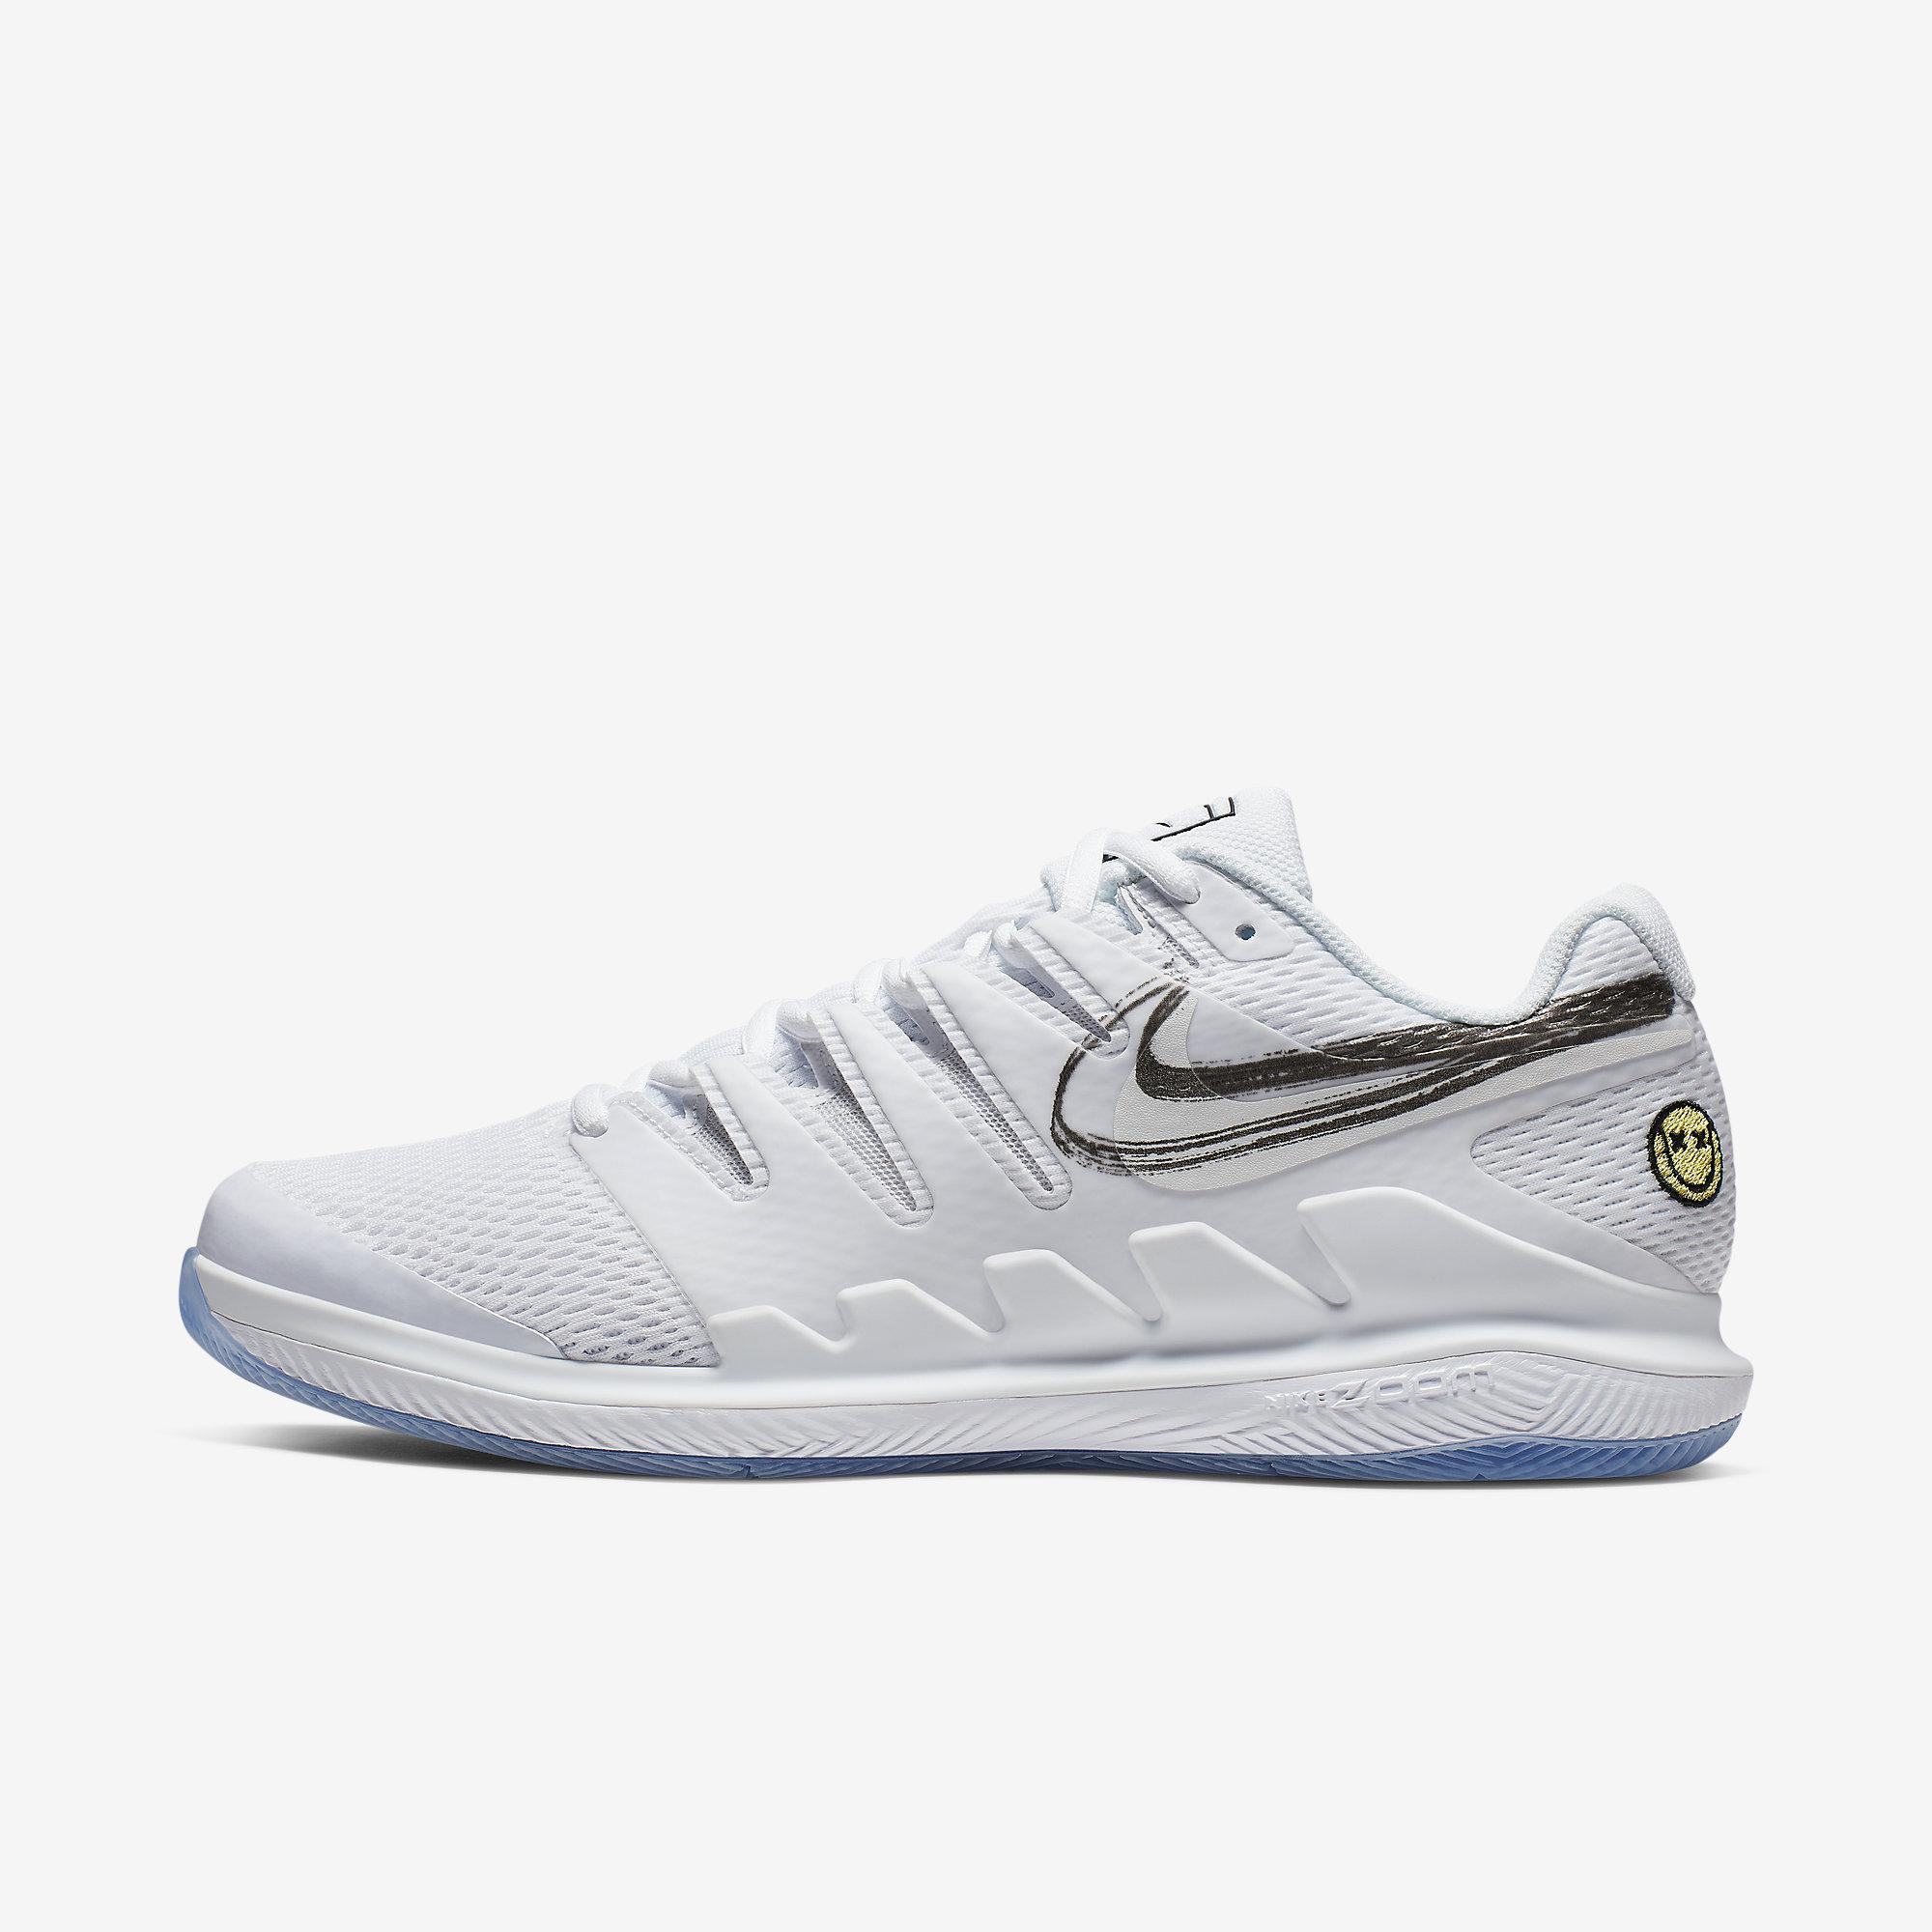 Nike Air Zoom Vapor X Carpet Shoe Men White, Dark Blue buy